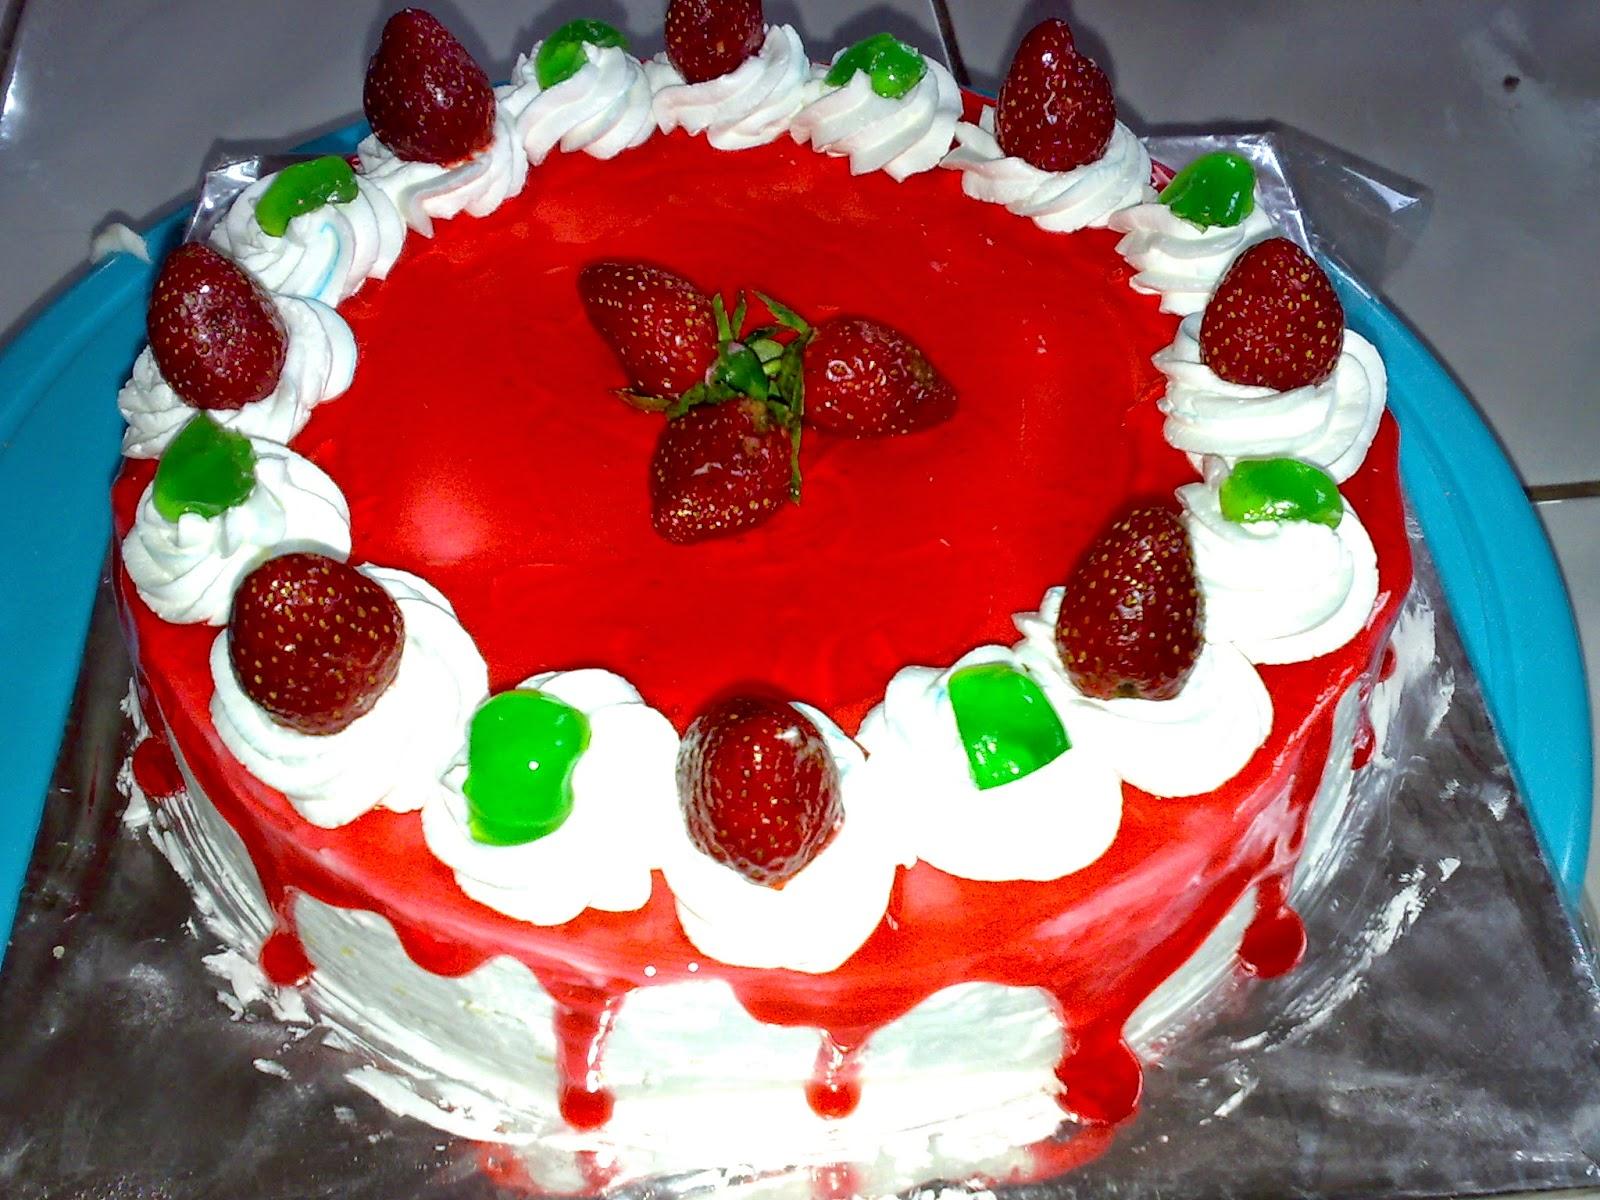 toko kue online padang